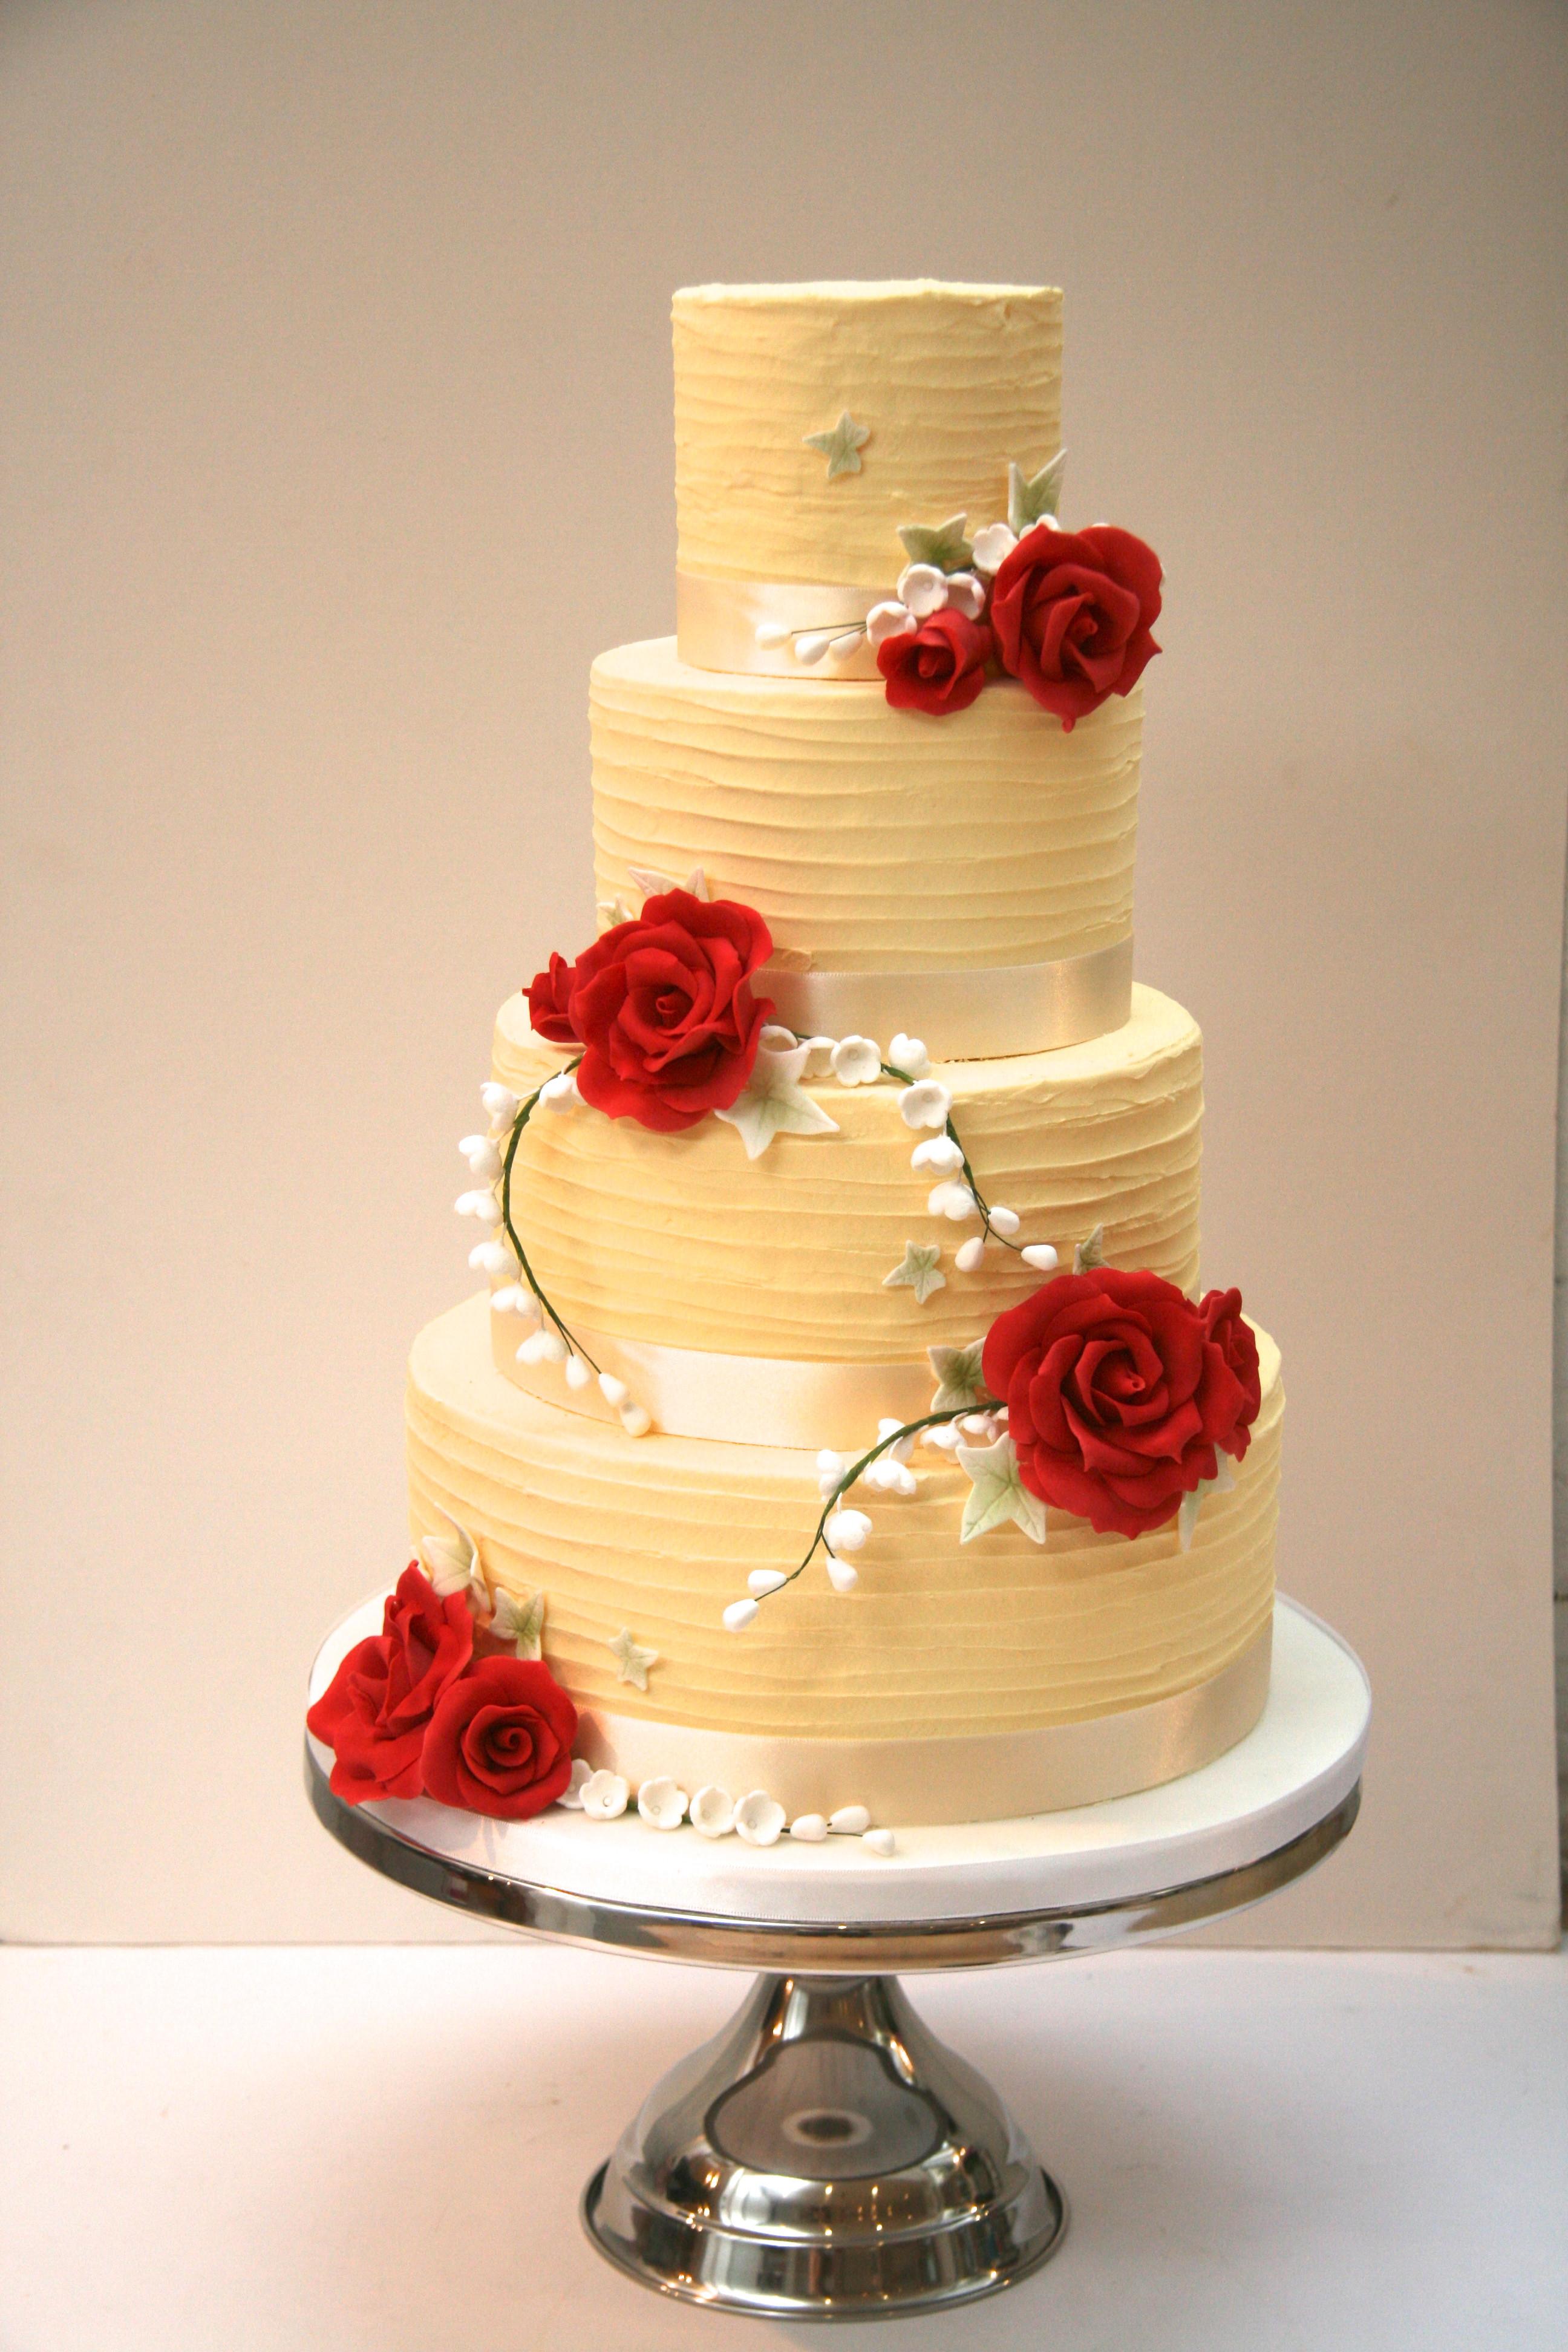 Chocolate Ganache Wedding Cakes  White Chocolate Ganache Wedding Cake with Red Roses and